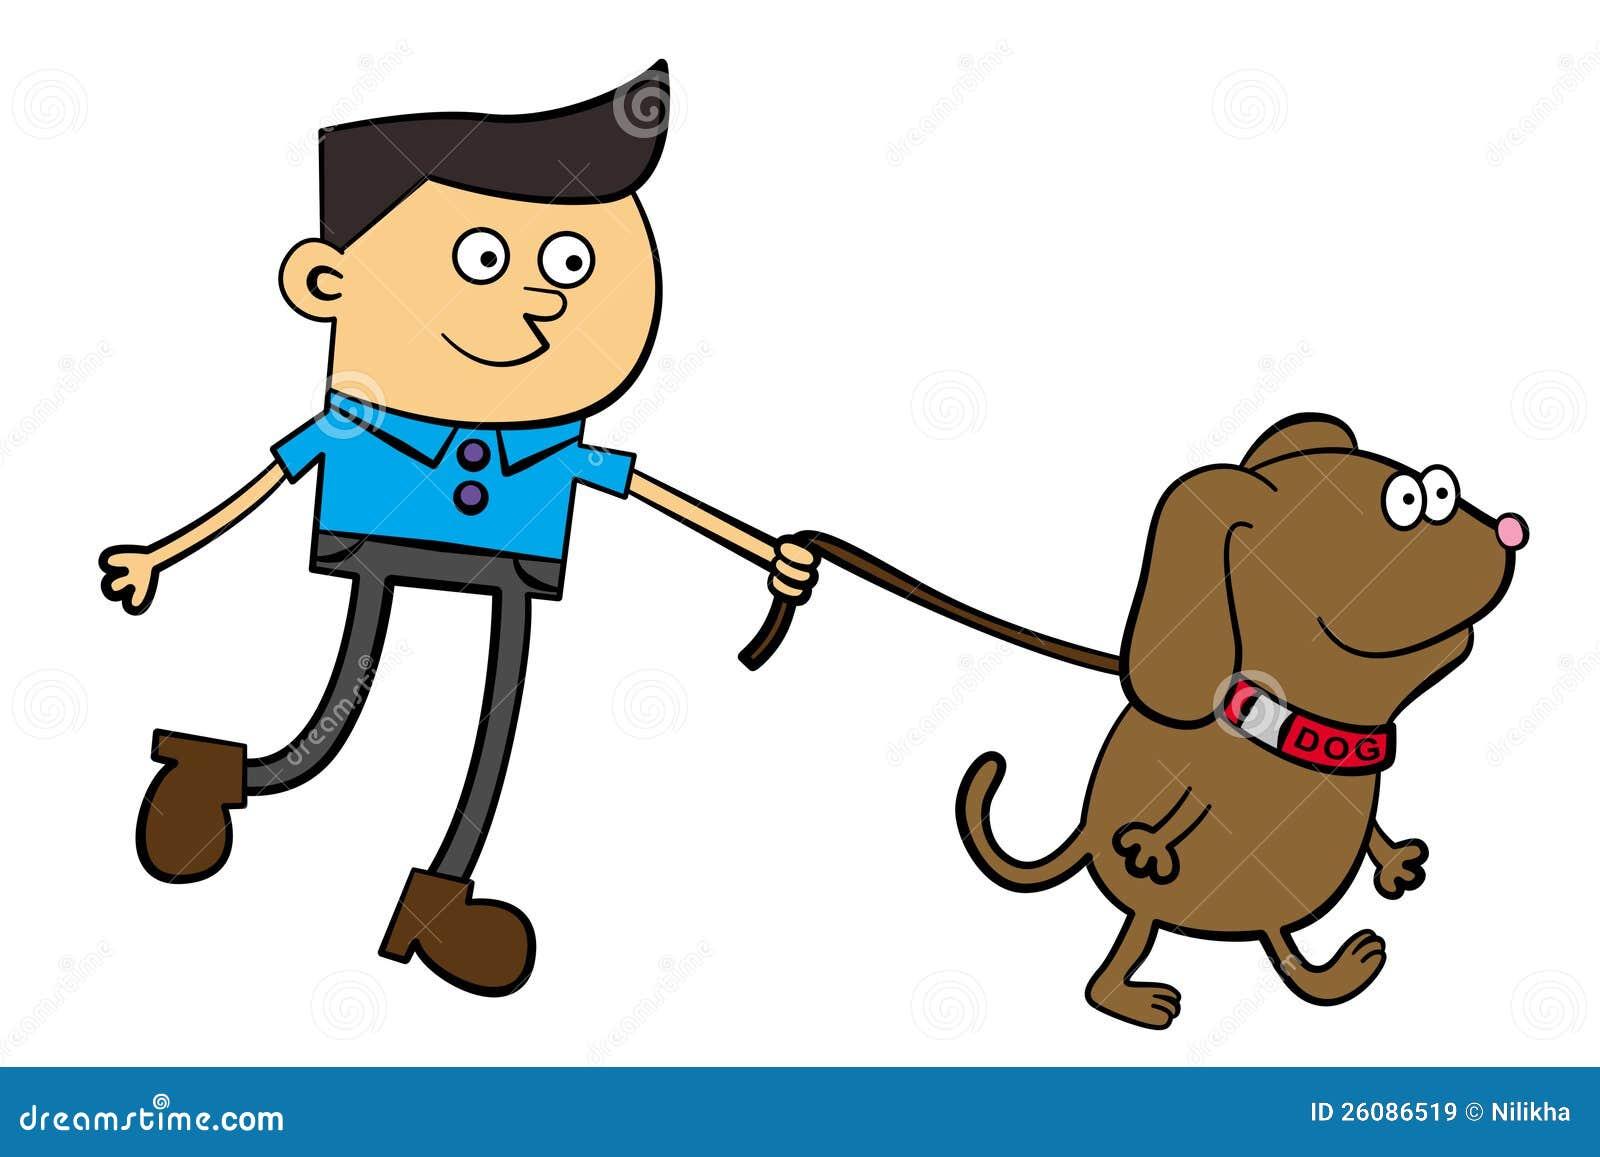 clipart girl walking dog - photo #45